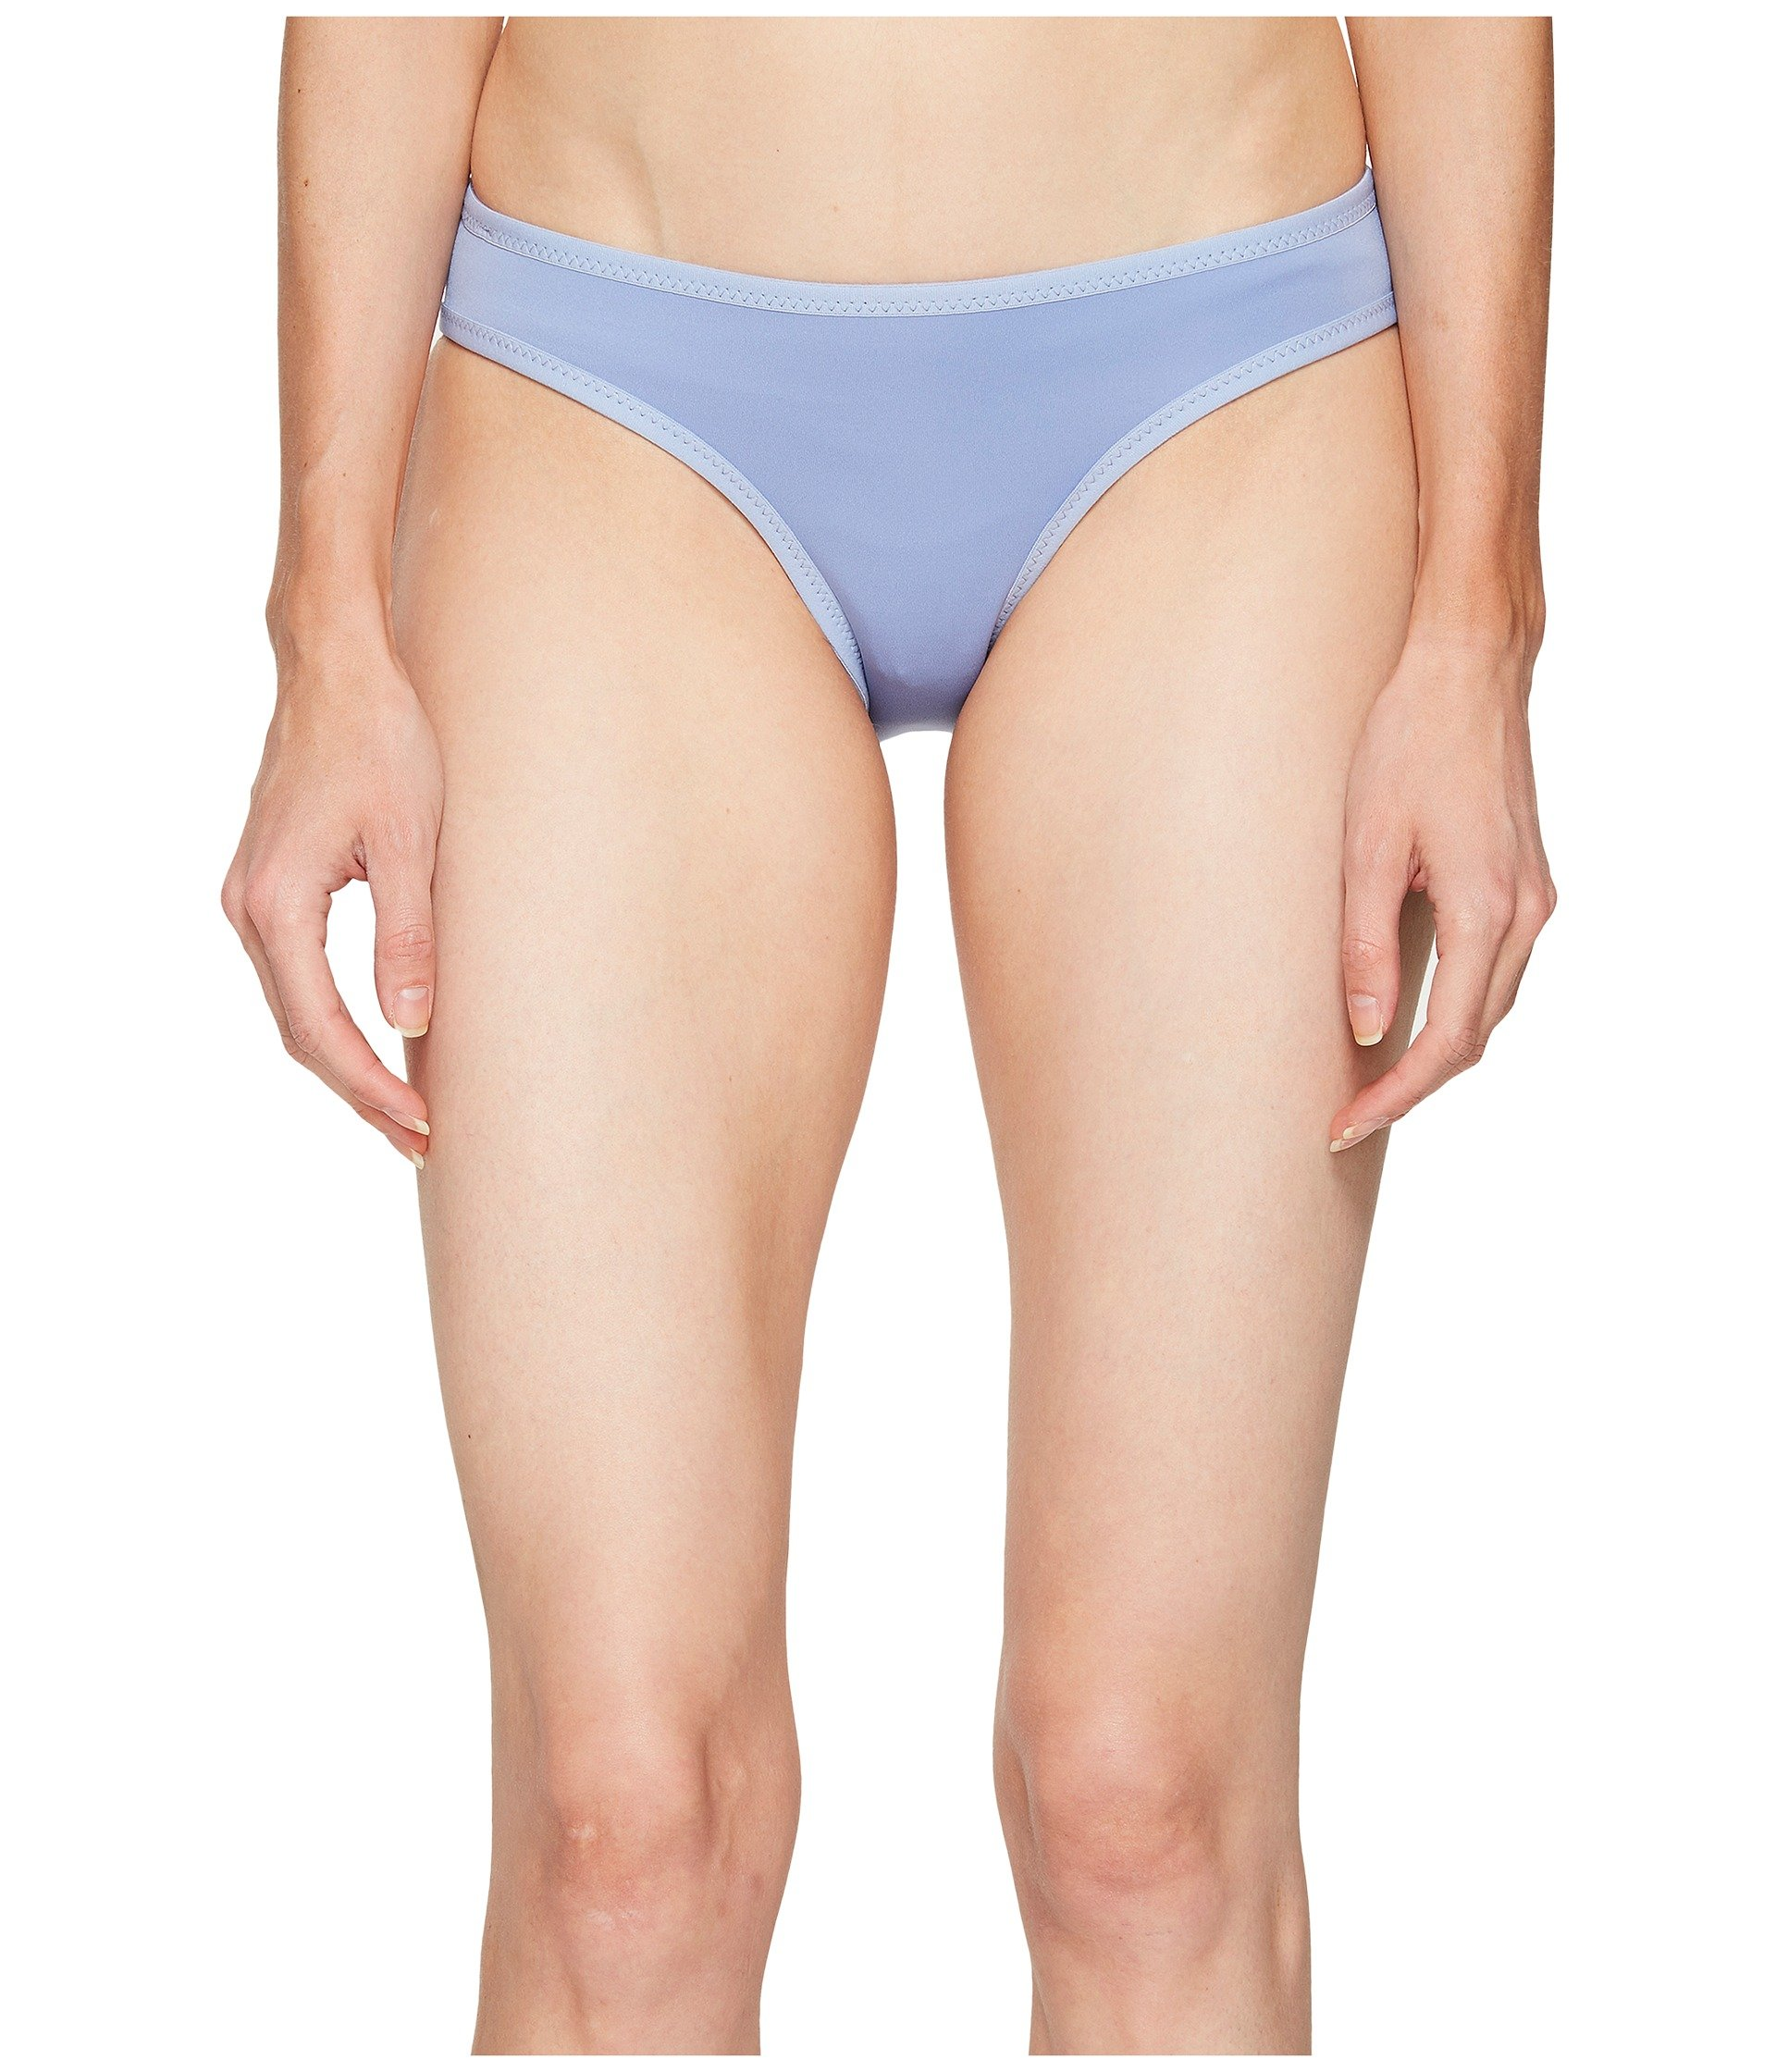 Bikini para Mujer adidas by Stella McCartney Bikini Flower Bottom S98857  + adidas en VeoyCompro.net